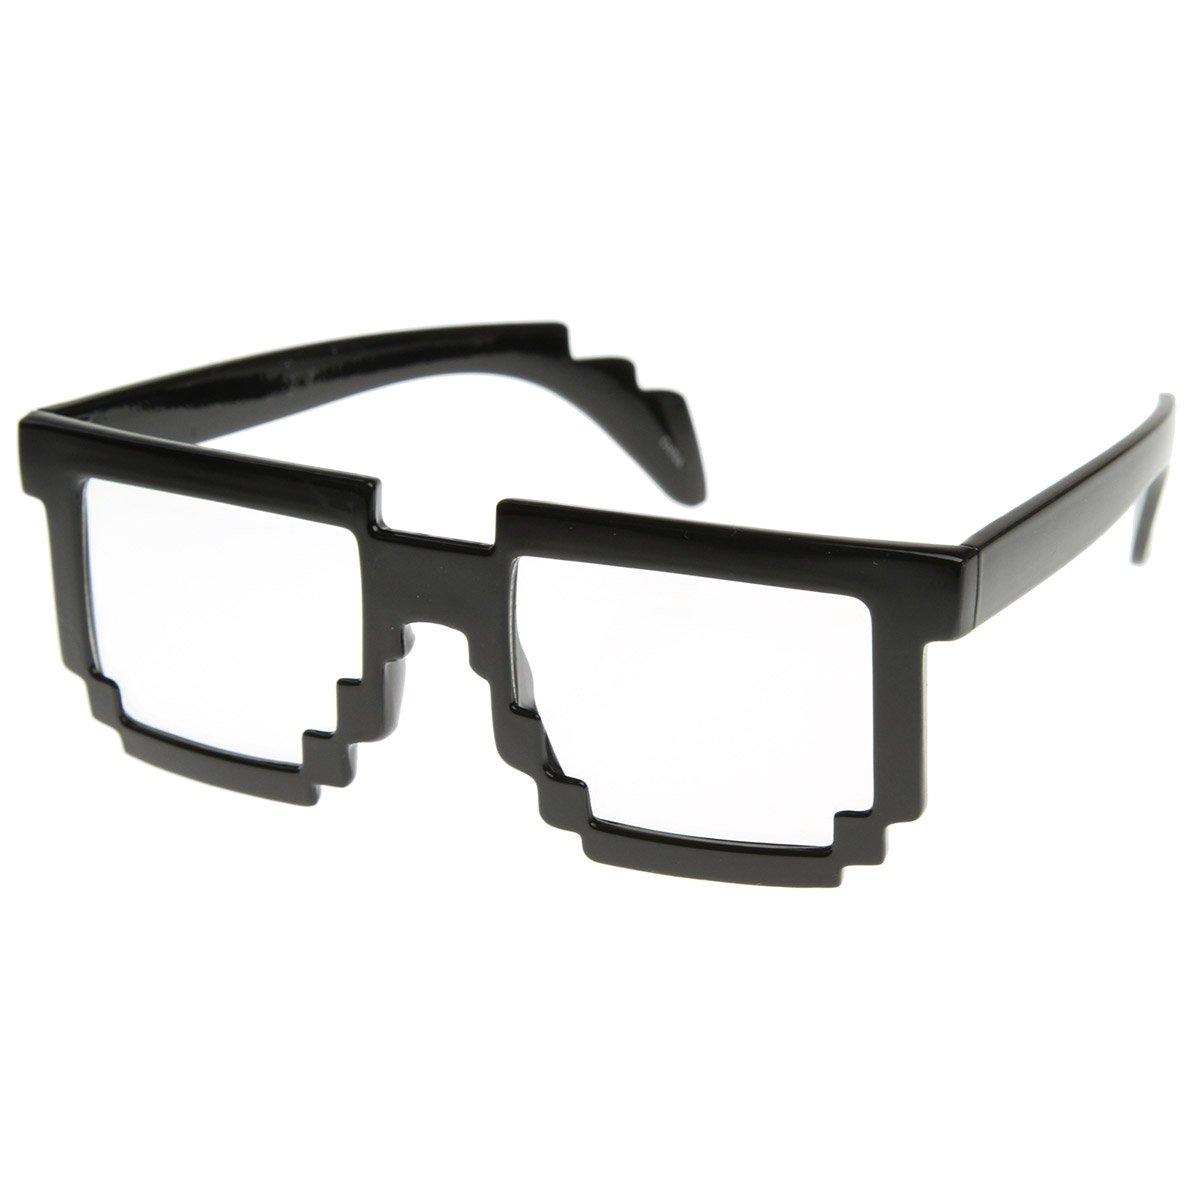 Amazon.com: zeroUV - Pixelated 8-Bit Clear Lens Computer Nerd Geek ...